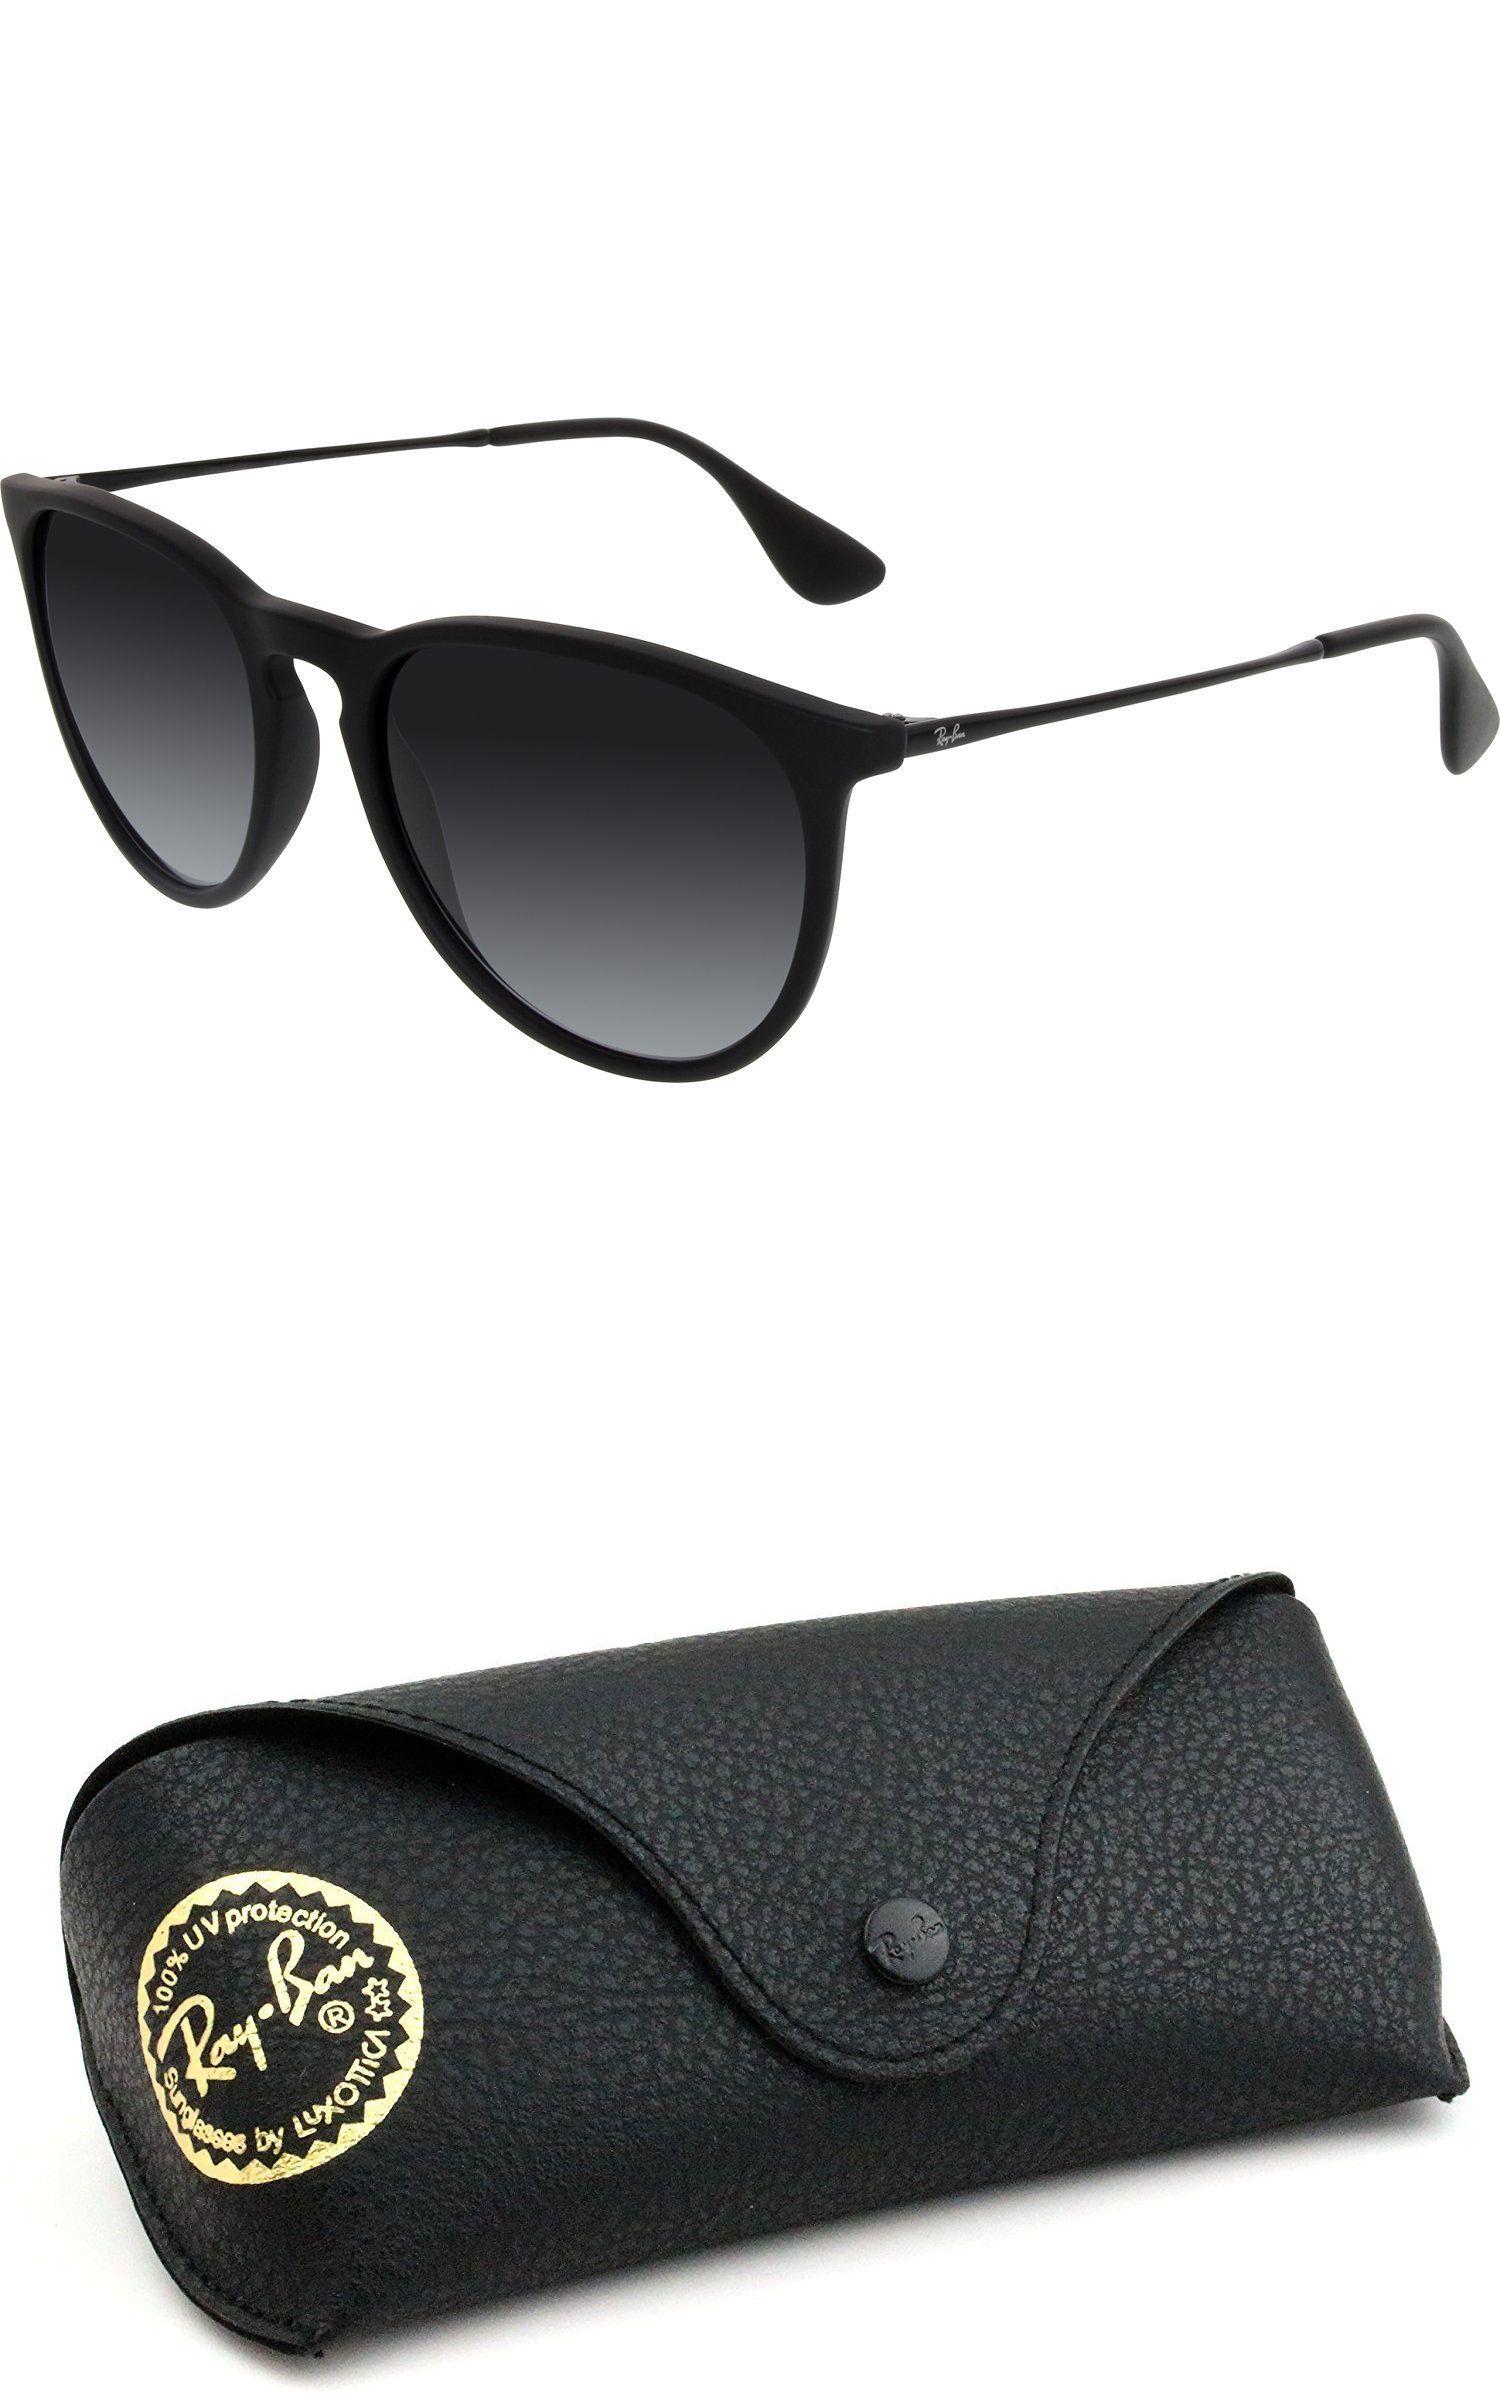 2cd5555290 ... cheapest sunglasses 45246 ray ban women s gradient erika rb4171 622 8g  54 black round c534c